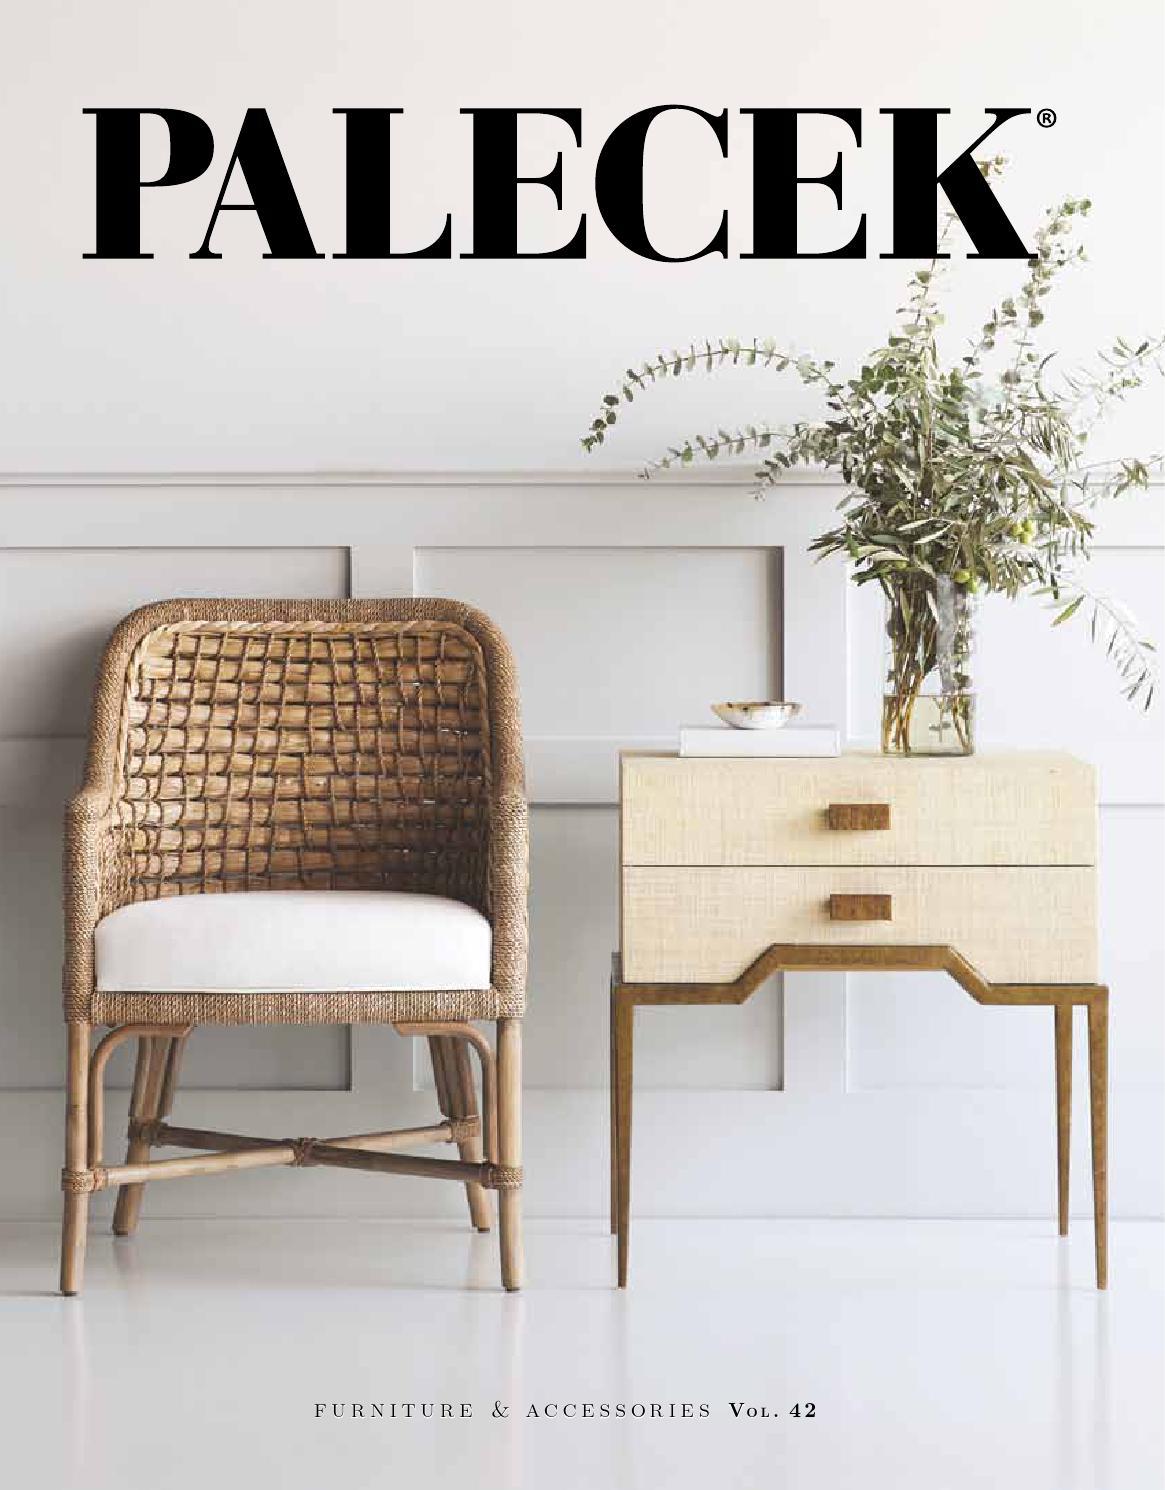 Palecek's 2016 furniture & accessories catalog vol. 42 by ...